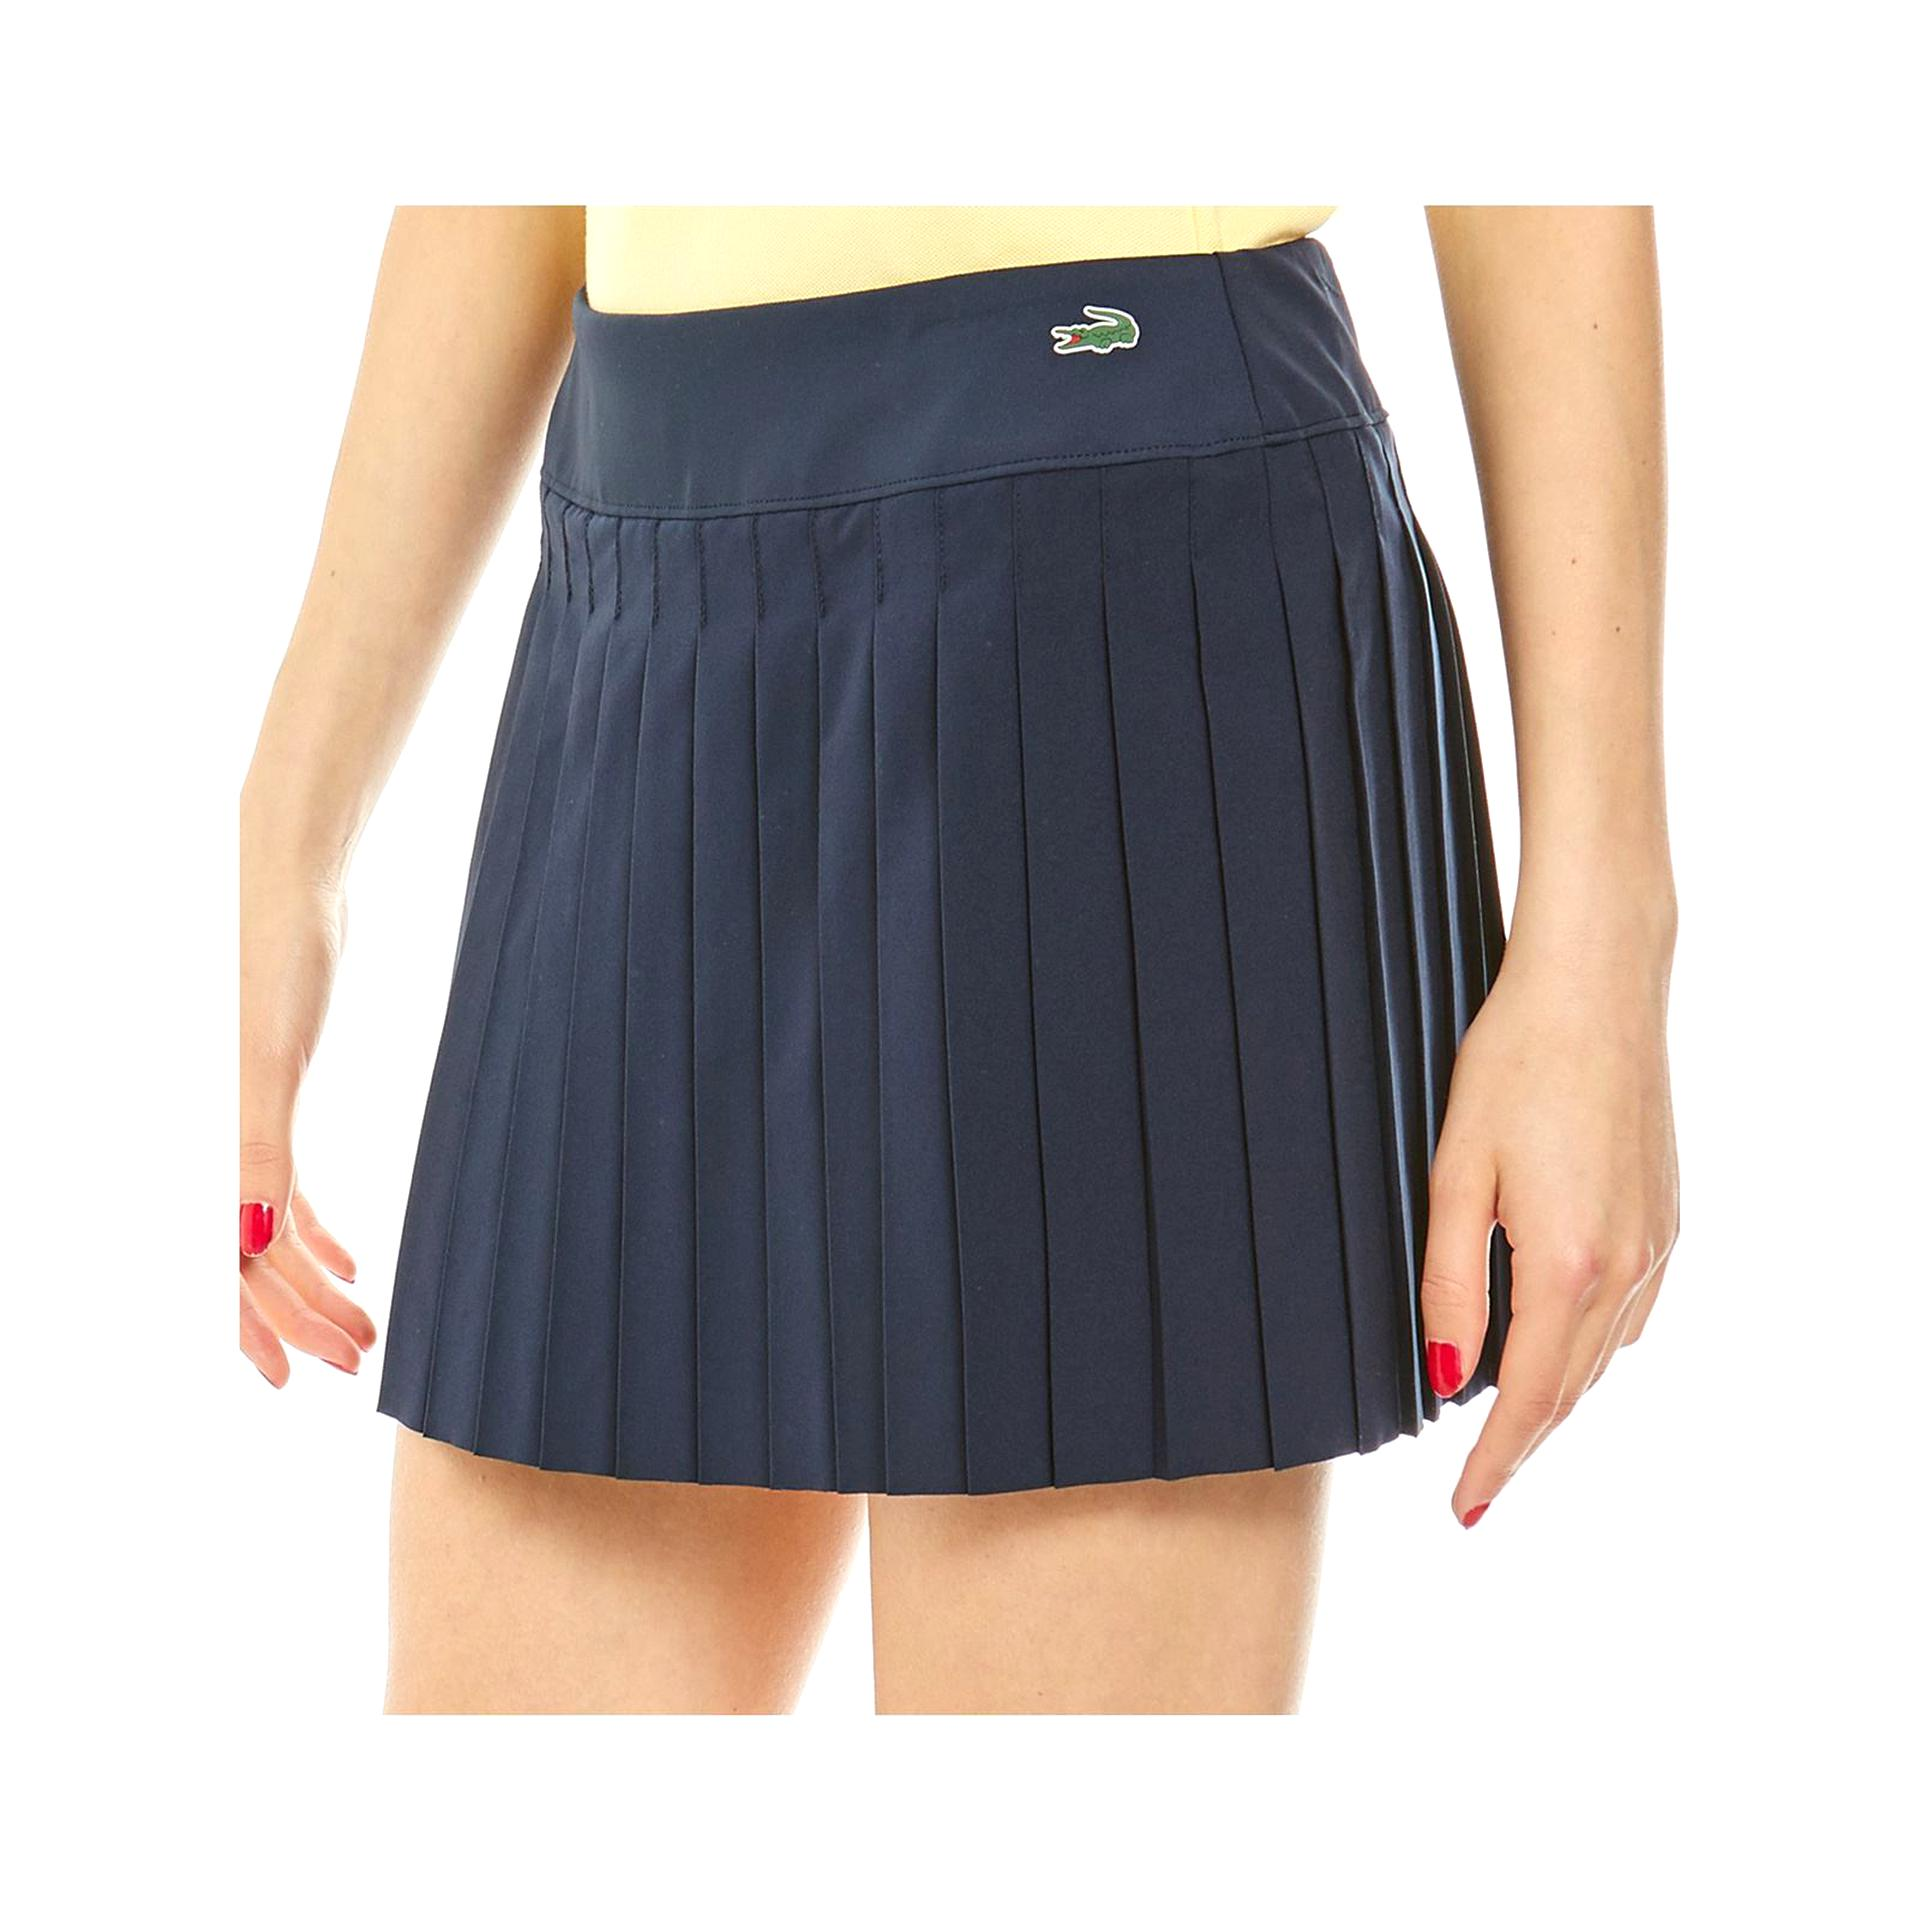 jupe tennis lacoste d'occasion